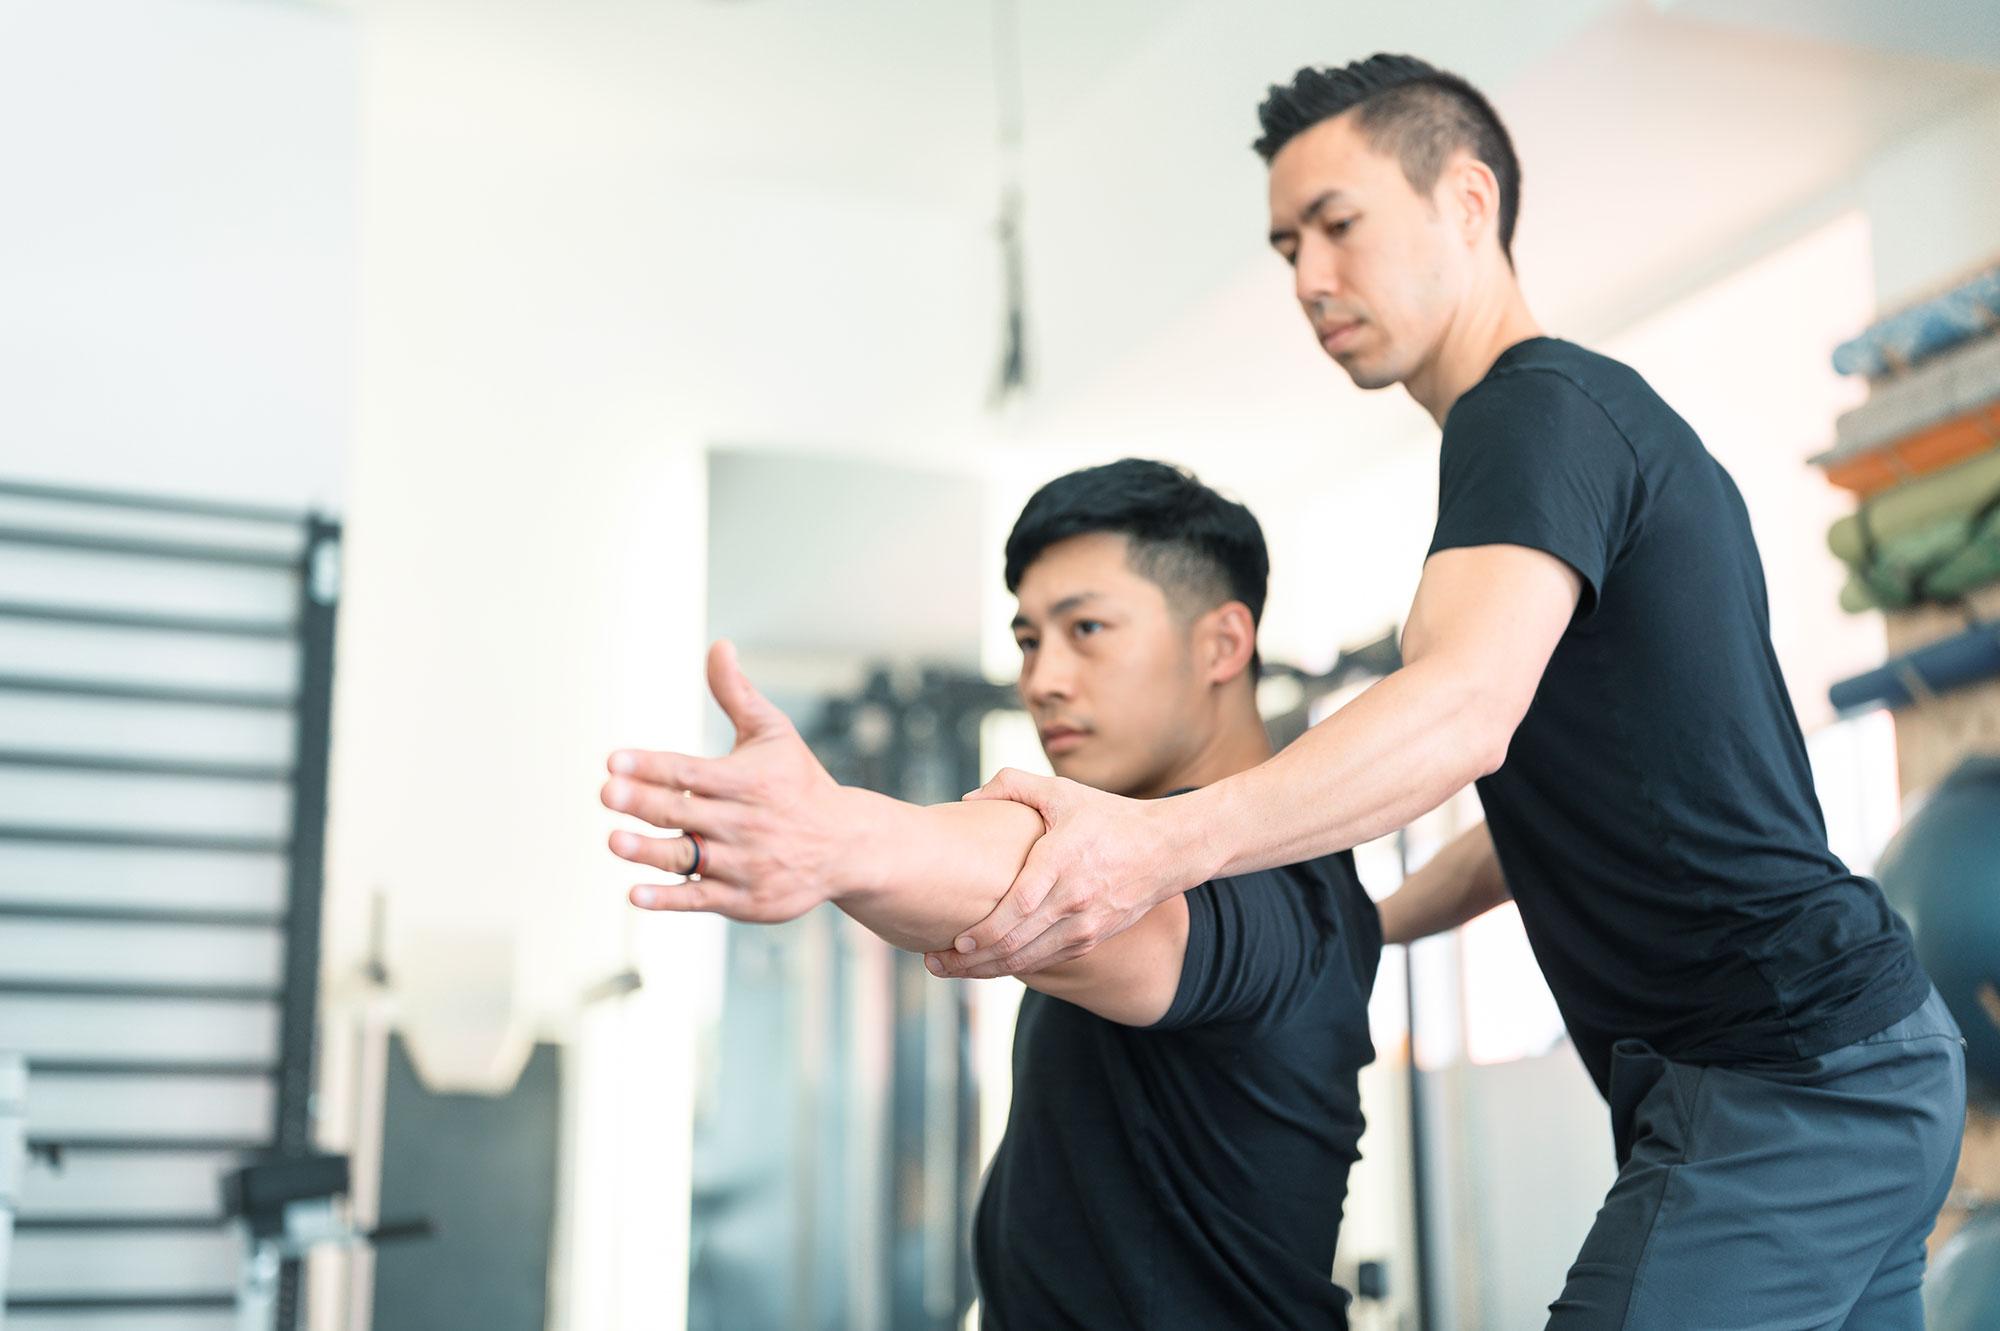 Exercise Toronto Registered Massage Therapist